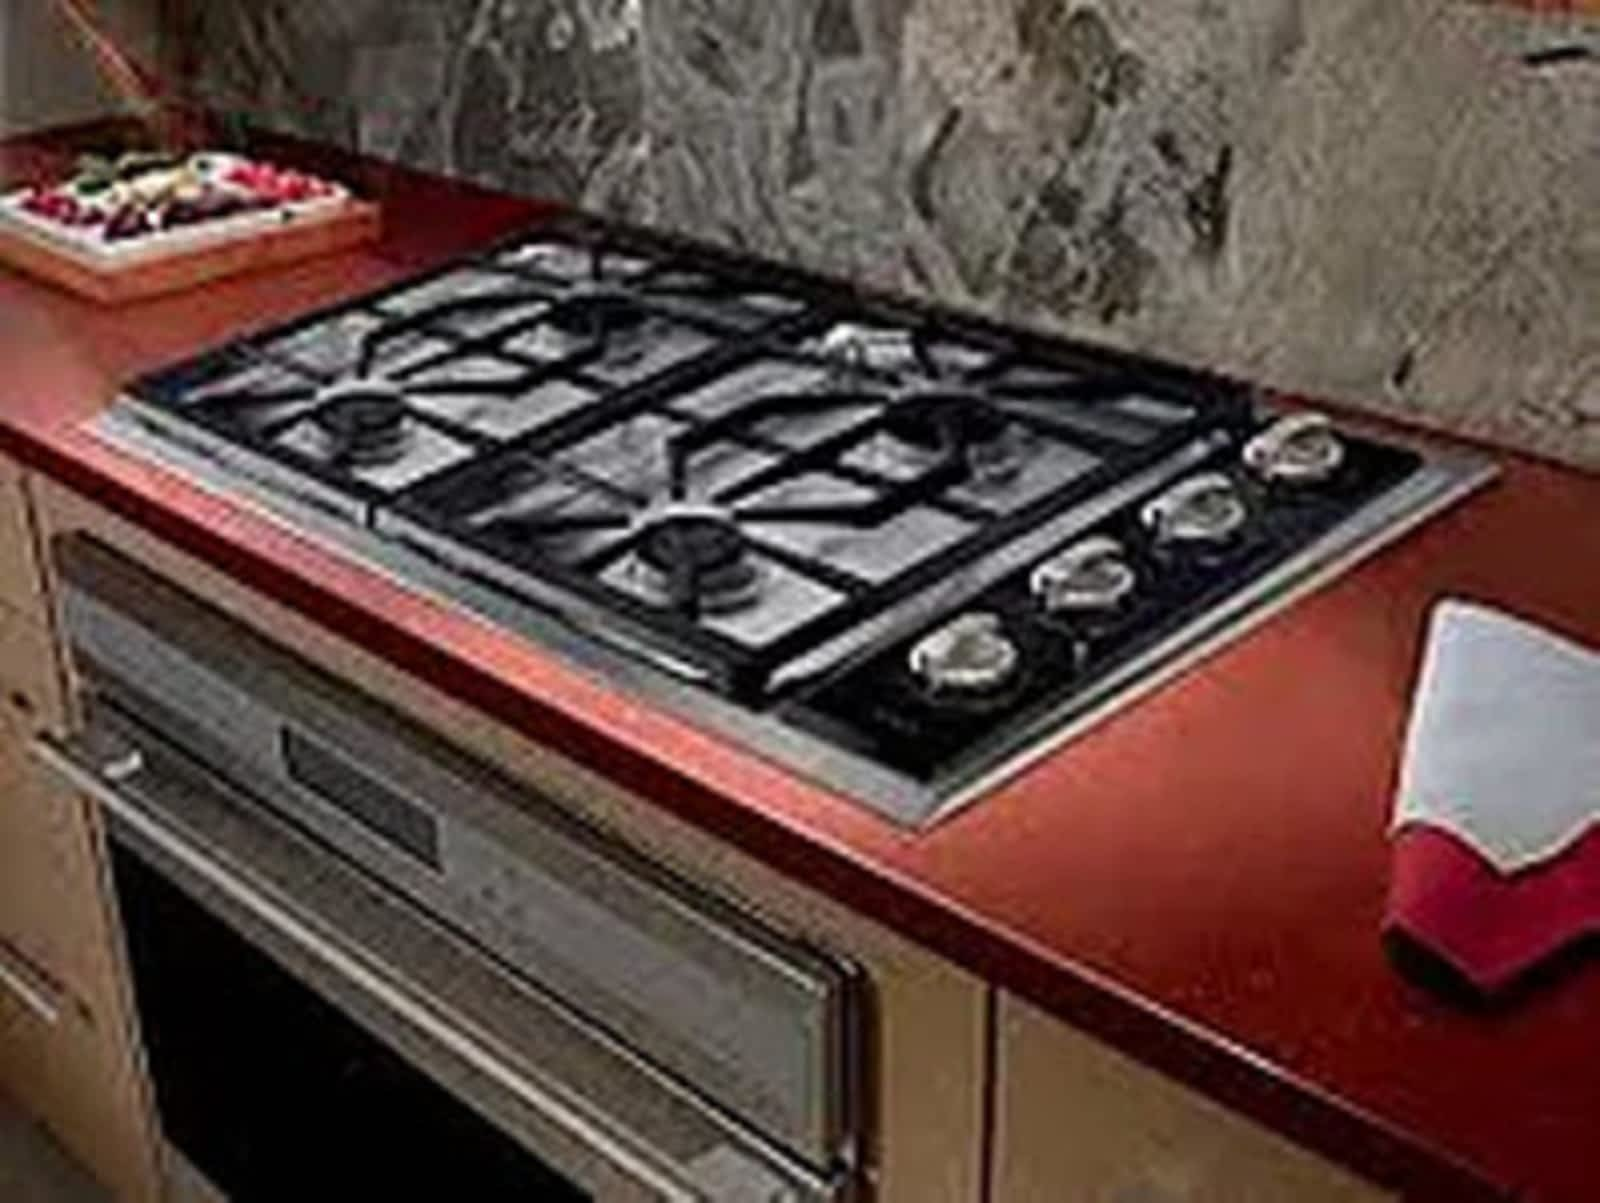 Home Comfort Kitchen Stove Home Comfort Vintage Stove